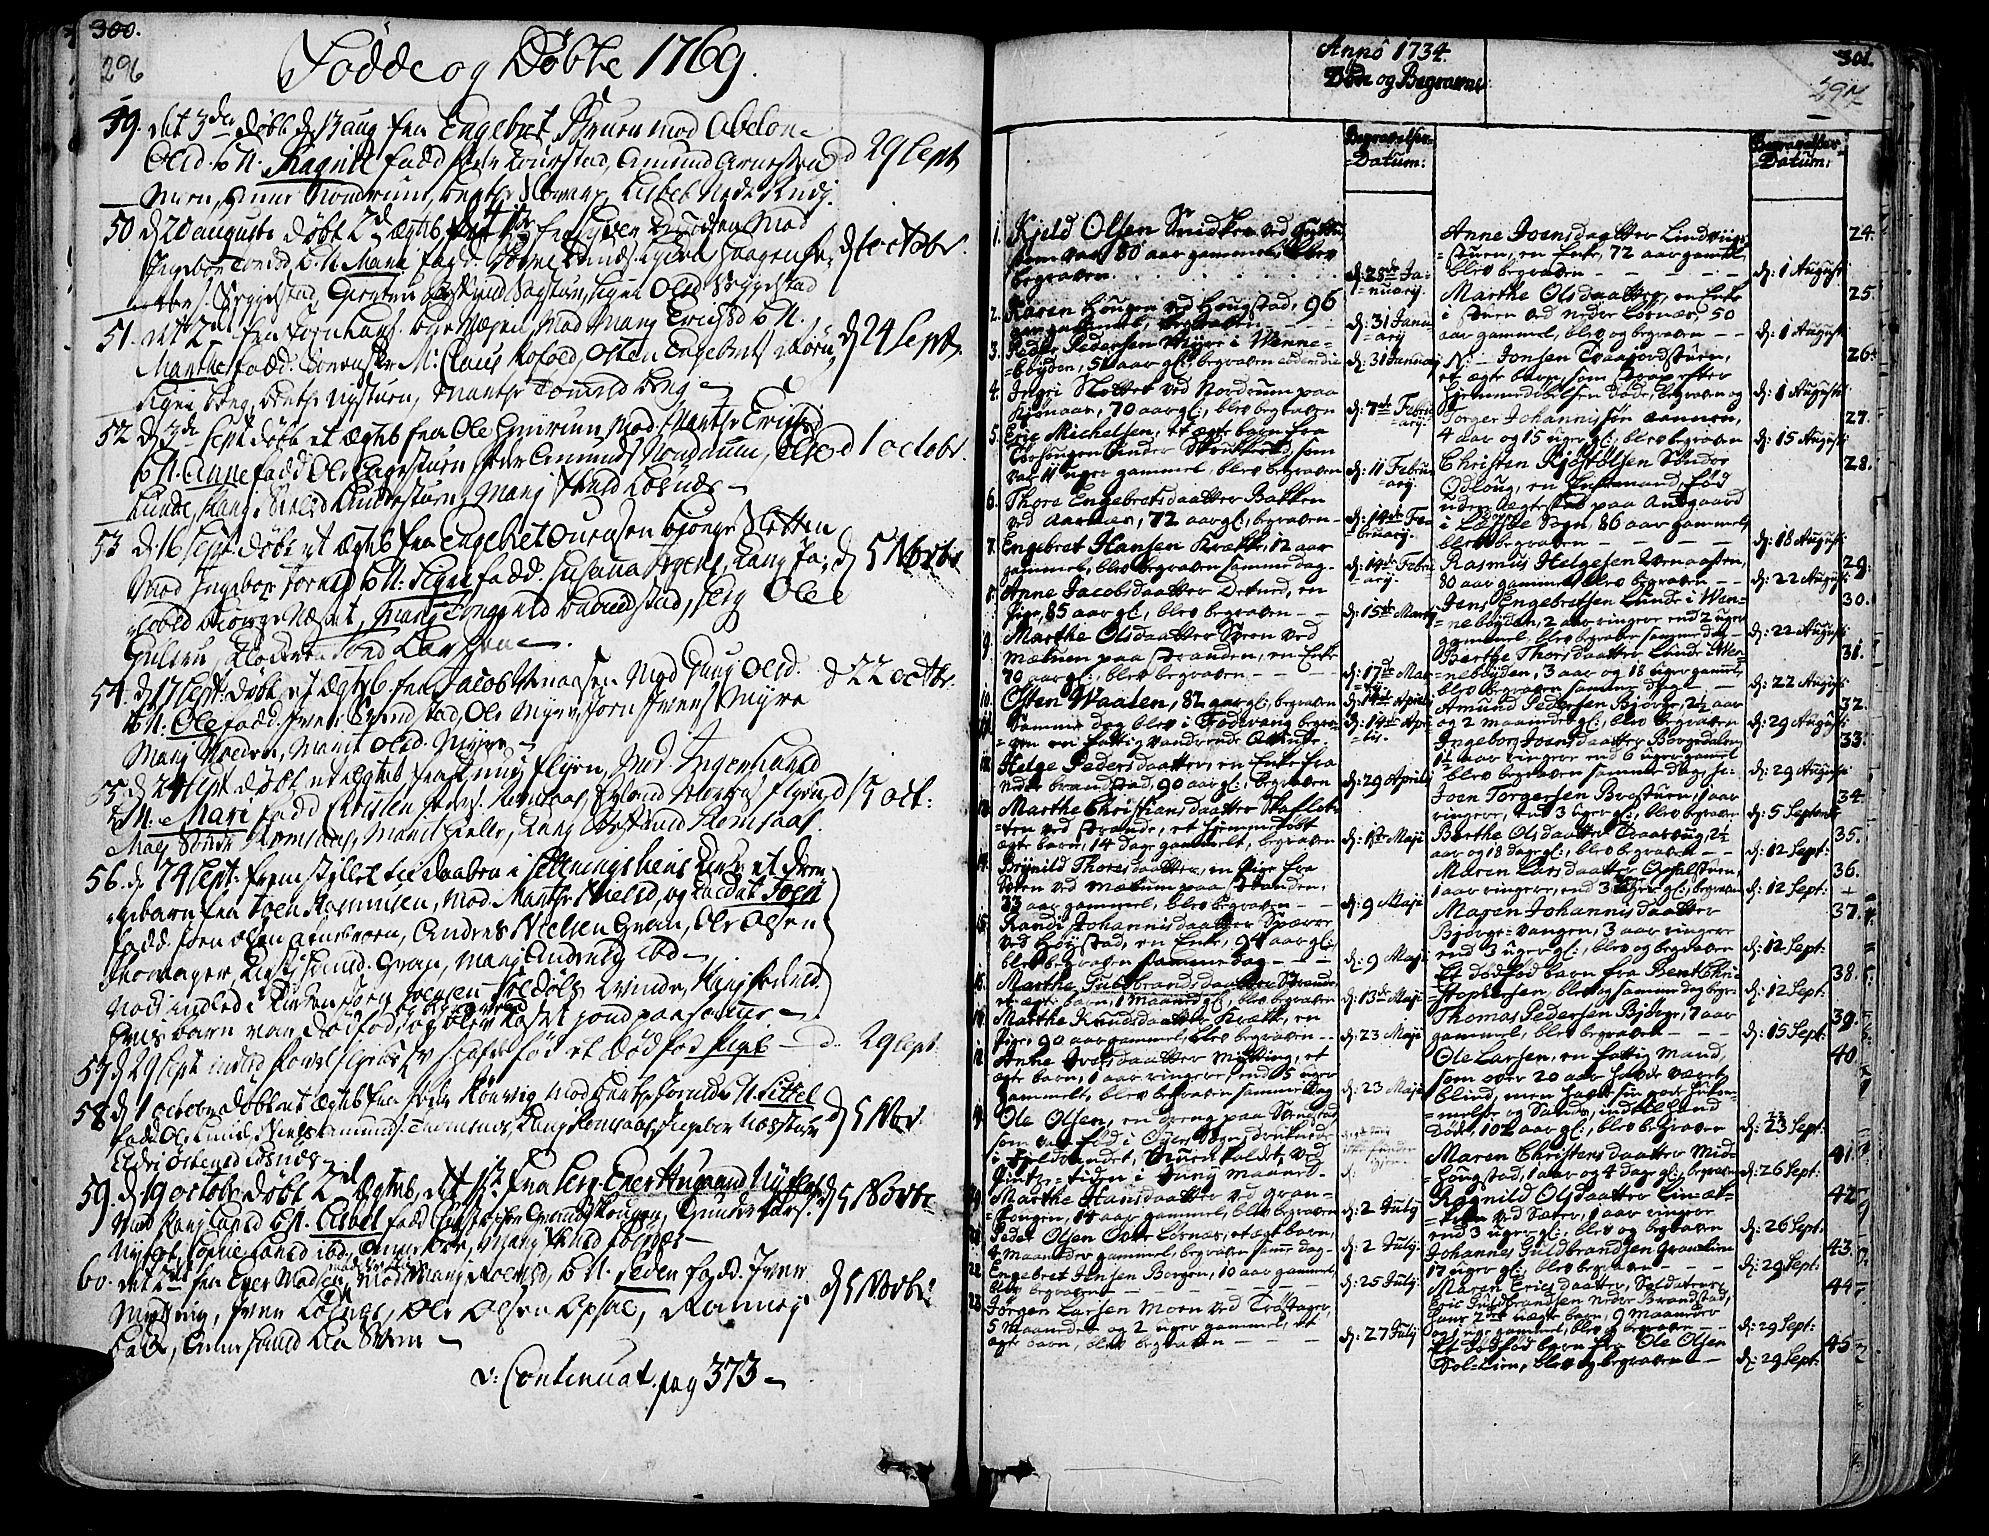 SAH, Ringebu prestekontor, Ministerialbok nr. 2, 1734-1780, s. 296-297